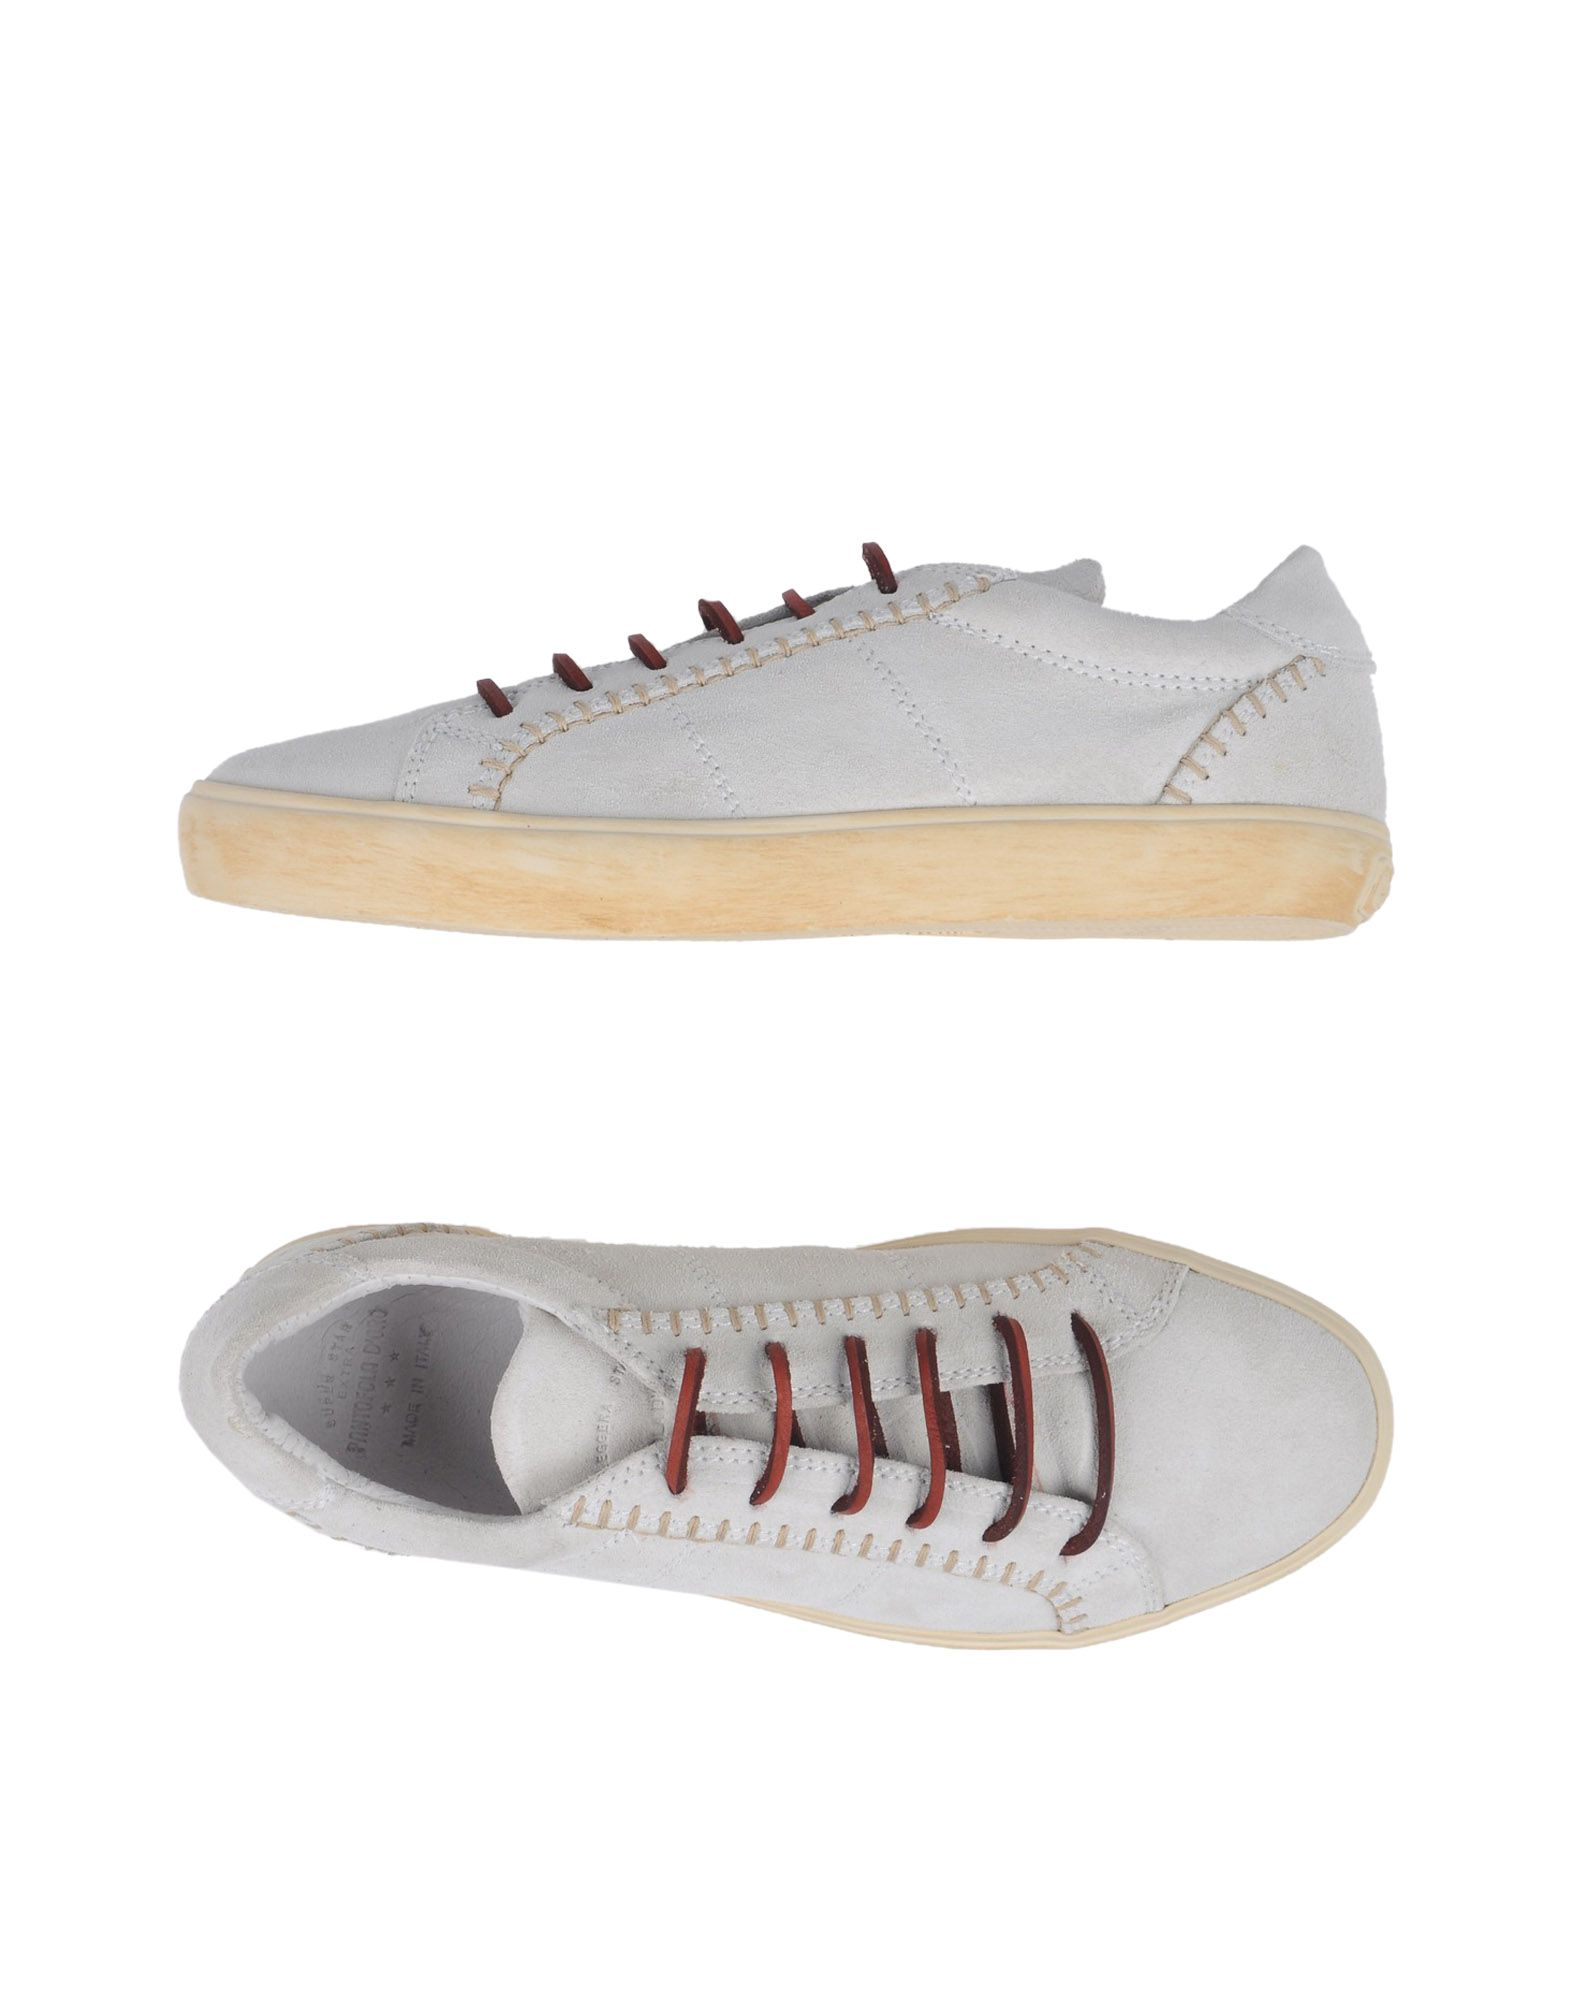 Pantofola D'oro Sneakers - Women Women Women Pantofola D'oro Sneakers online on  Canada - 11353907OS 5d3bd6